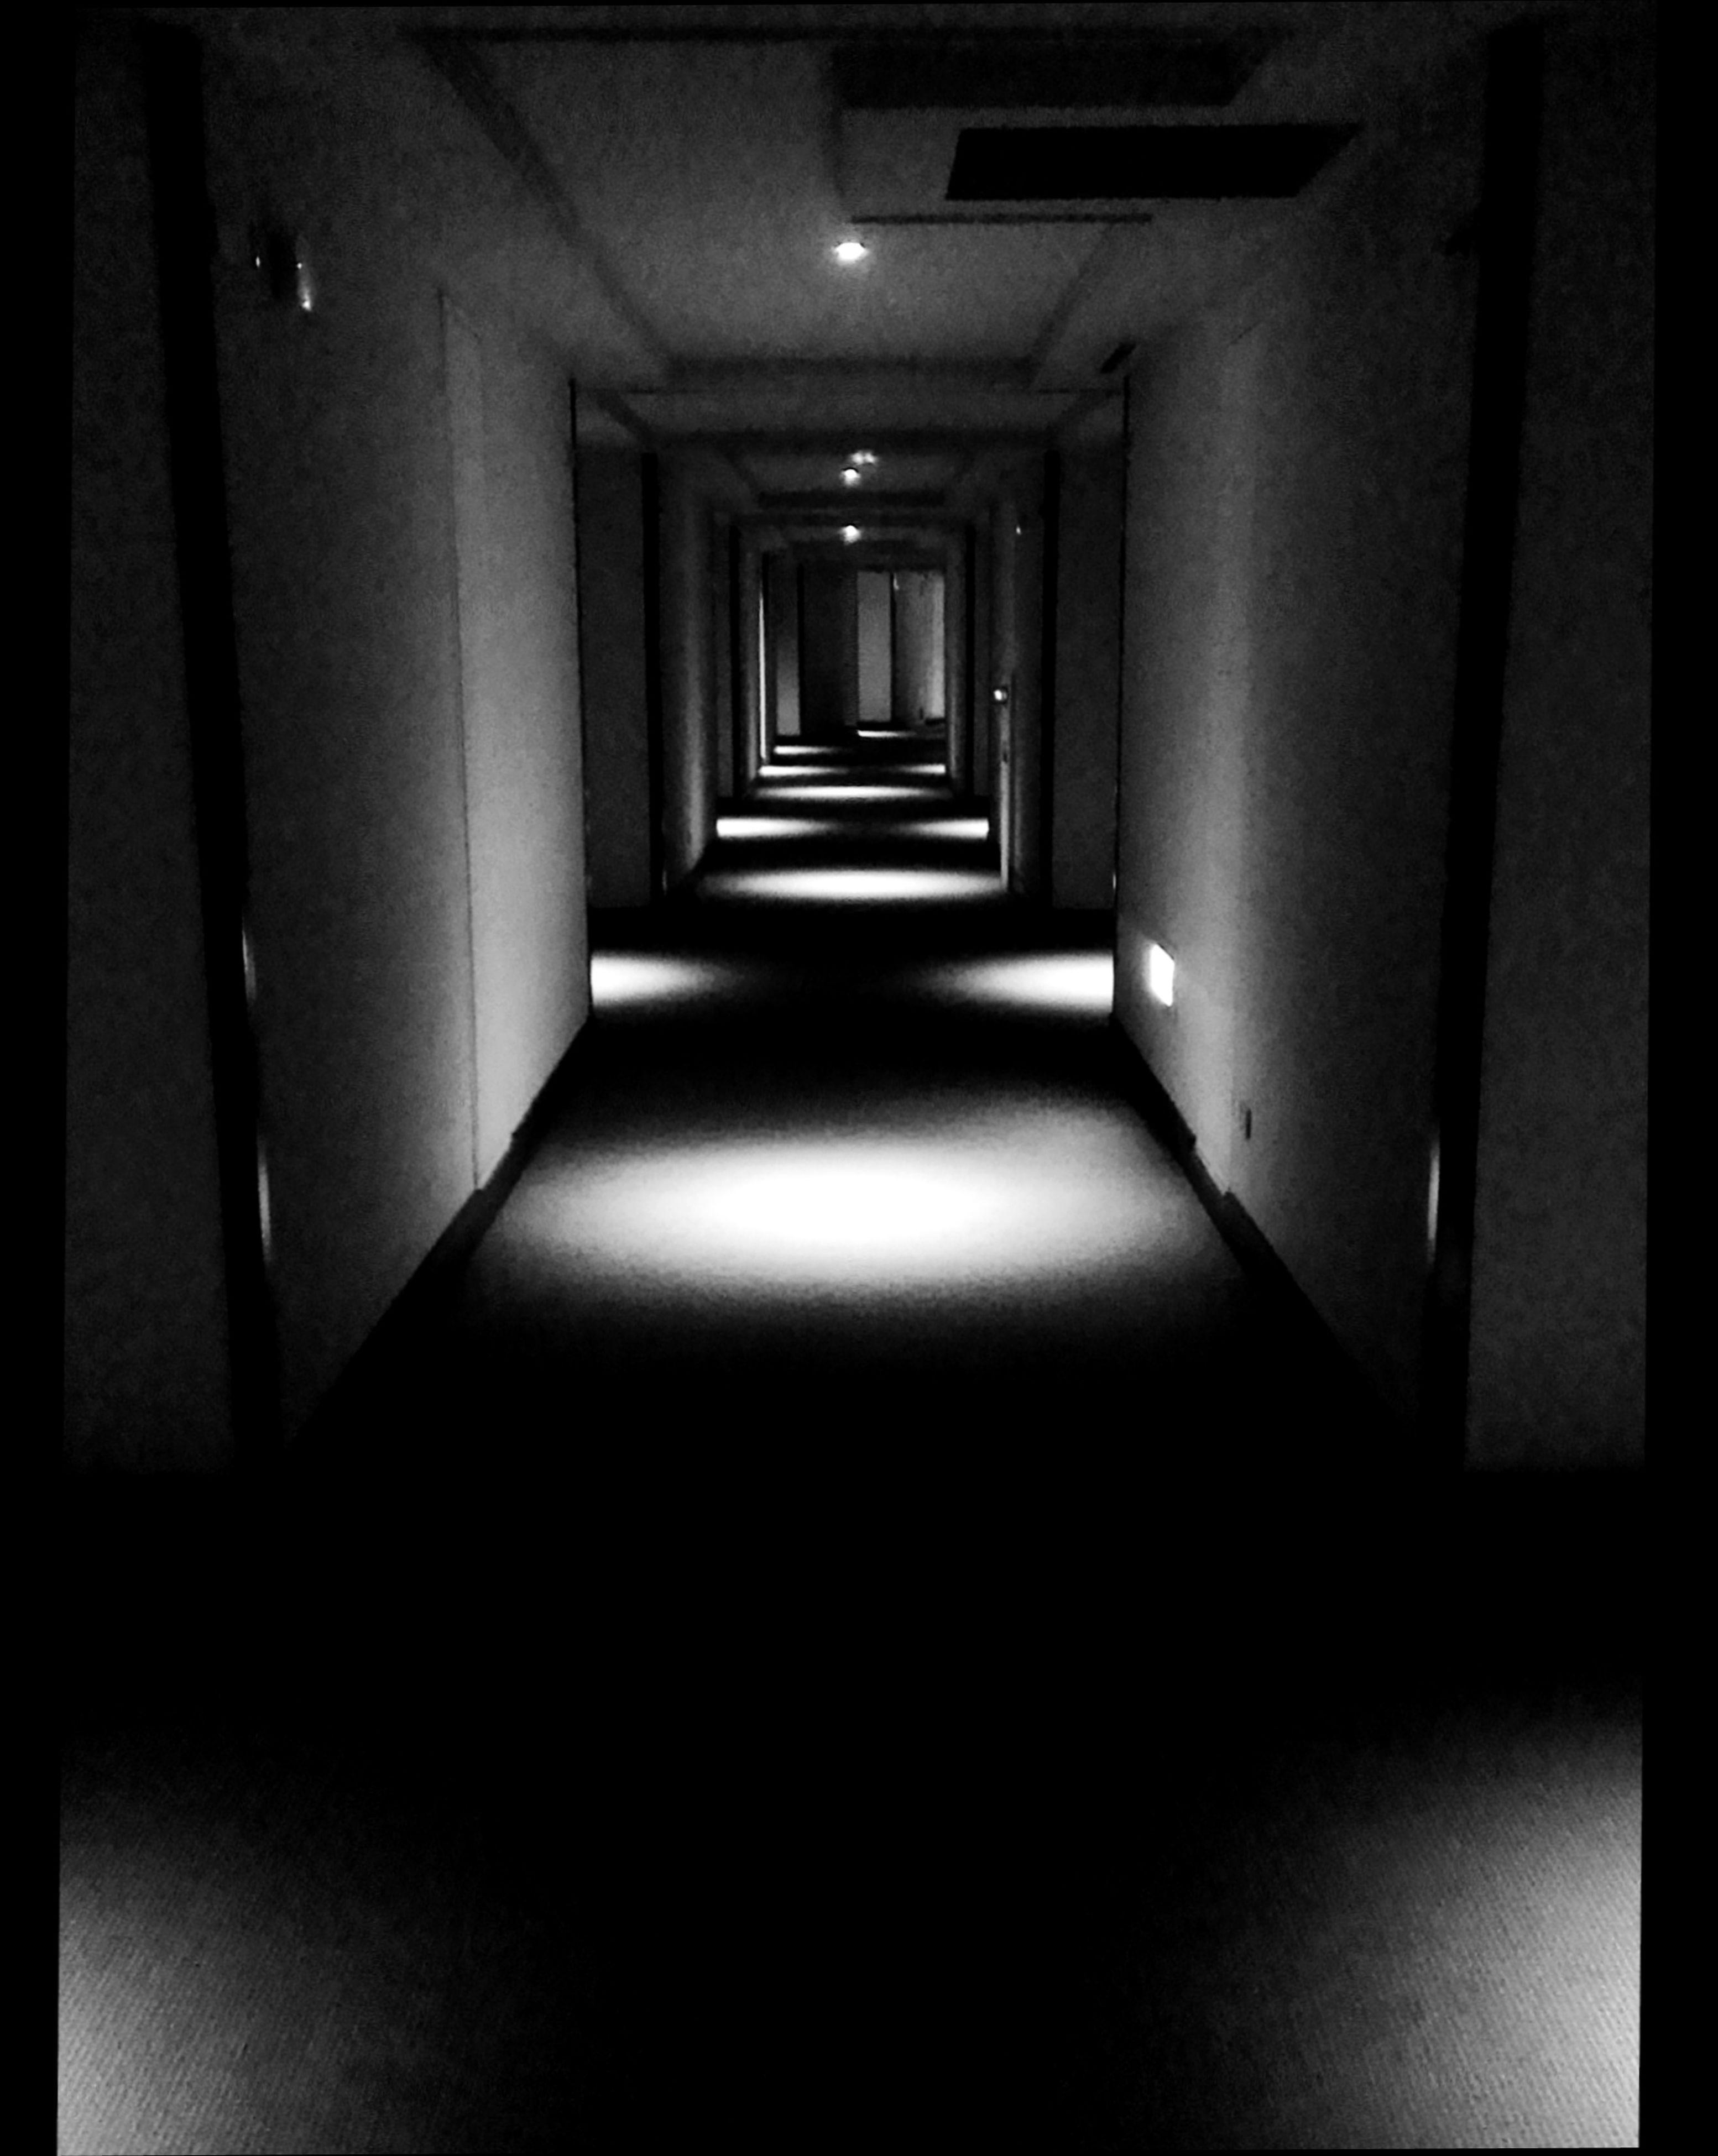 the way forward, indoors, architecture, corridor, built structure, diminishing perspective, empty, narrow, absence, vanishing point, wall - building feature, door, wall, building, illuminated, no people, long, doorway, sunlight, walkway